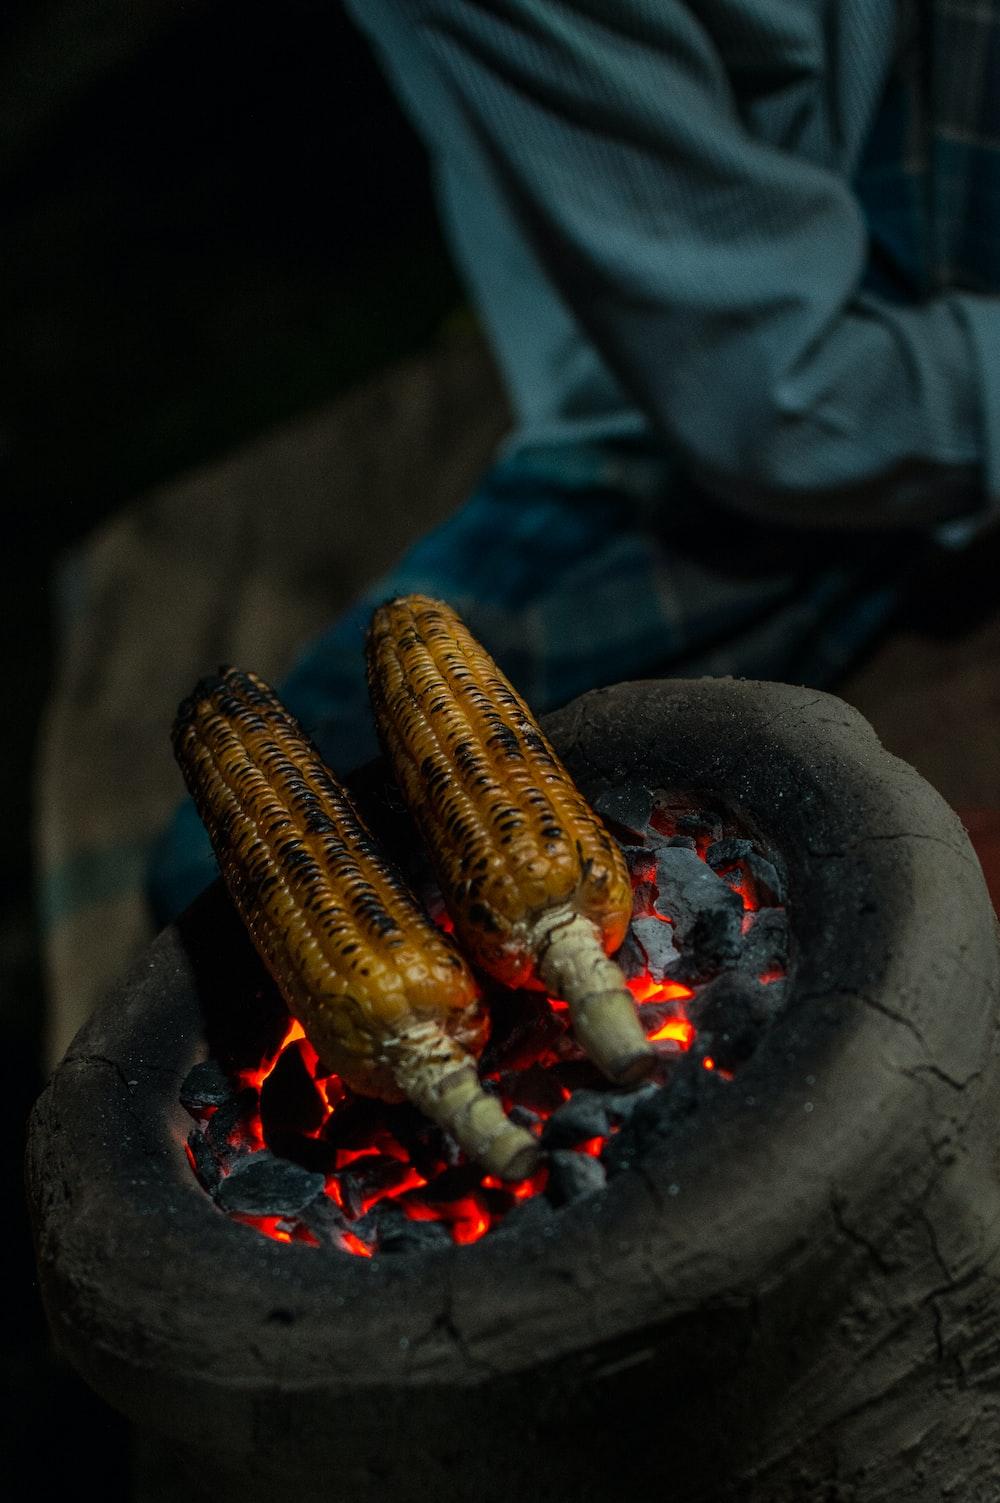 sweetcorn on charcoal